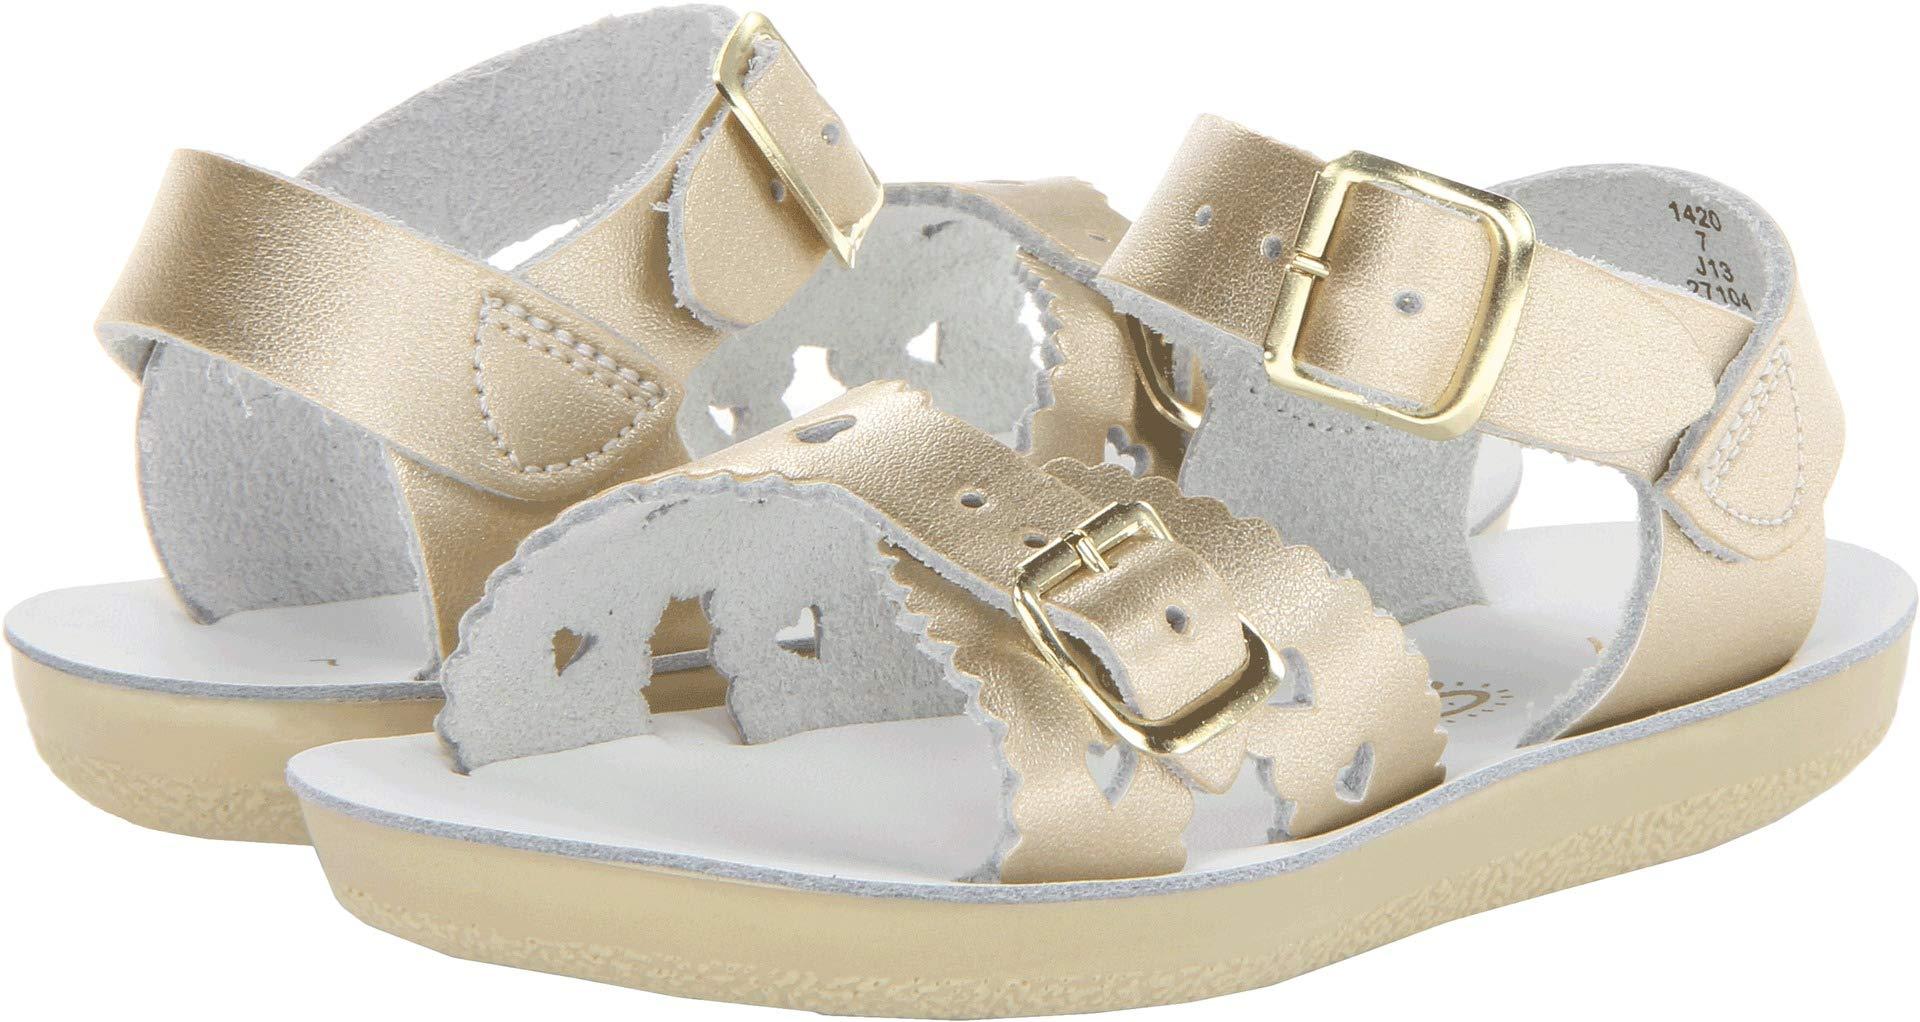 Salt-Water Style 1400 Sun-San Sweetheart Sandal,Gold,9 M US Toddler